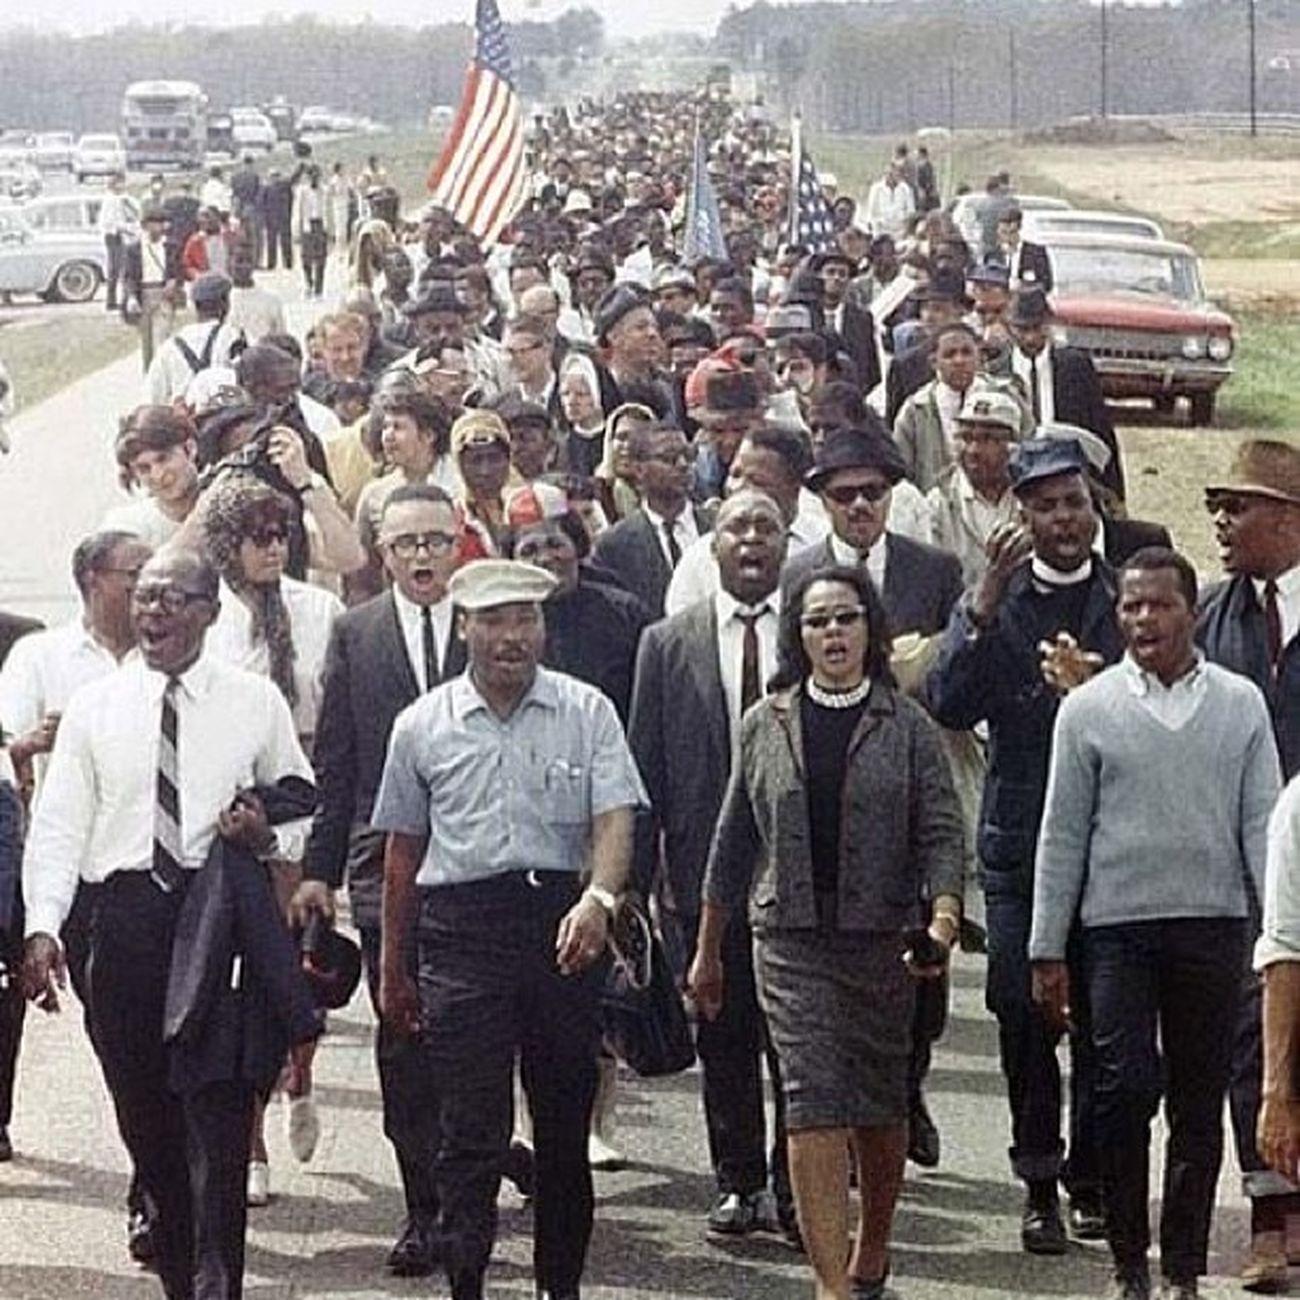 MartinLutherKingJr CorettaScottKing Blackhistory Blackpower